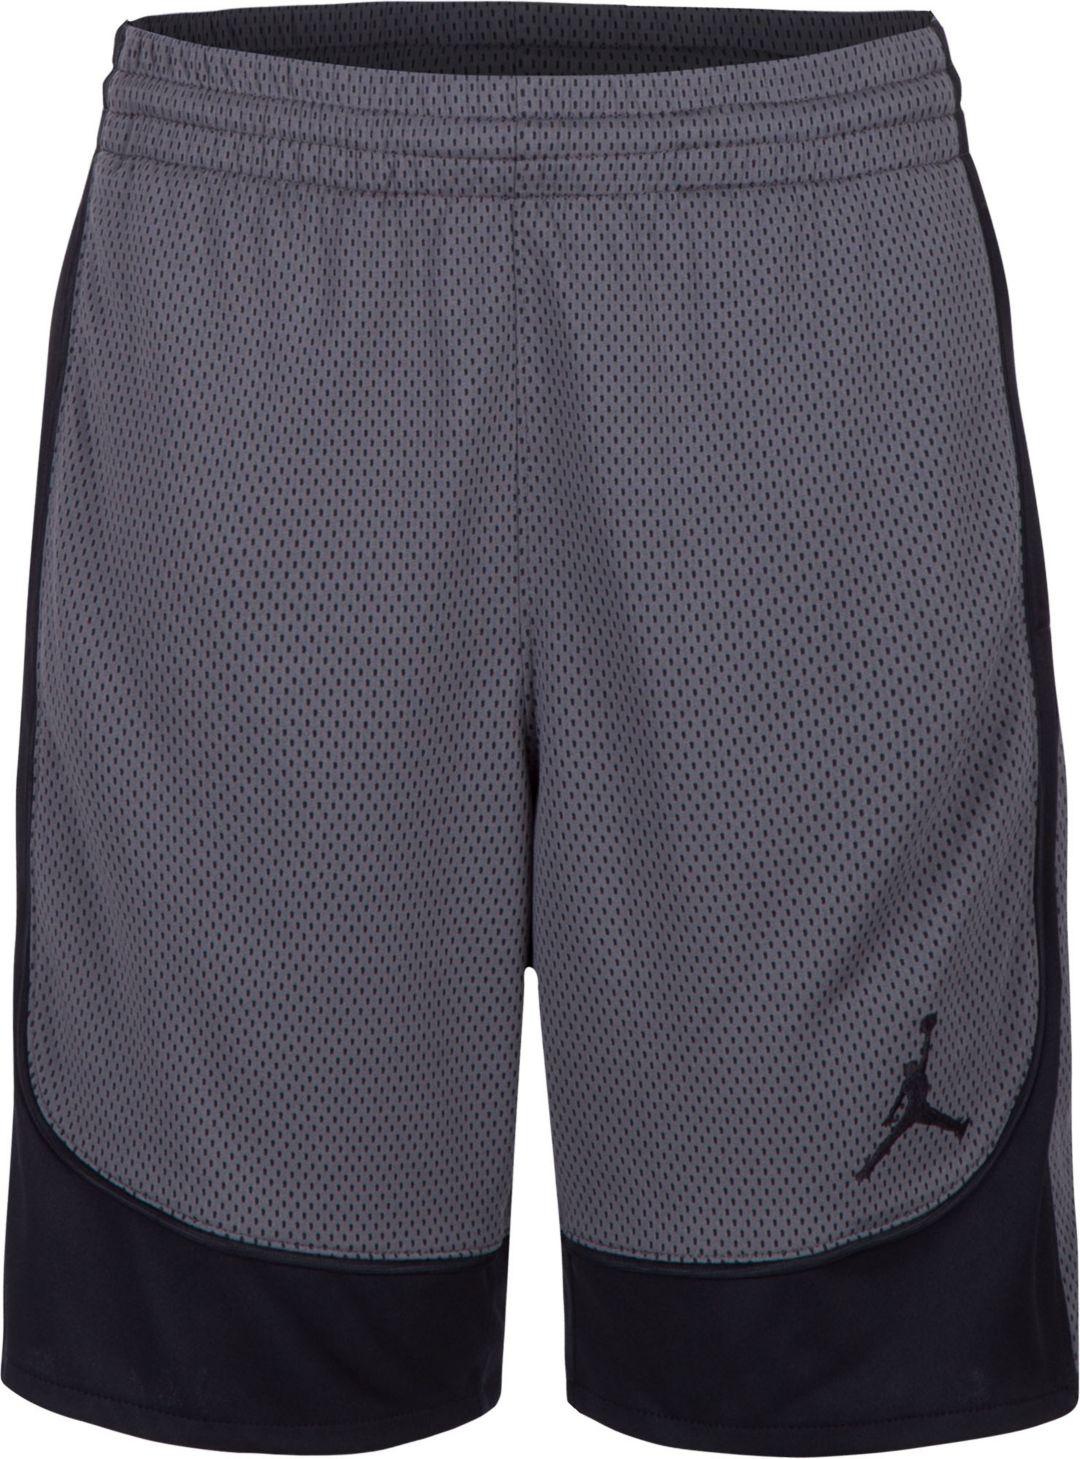 online retailer 020c2 ee2e0 Jordan Boys' Air 2.0 Colorblock Shorts